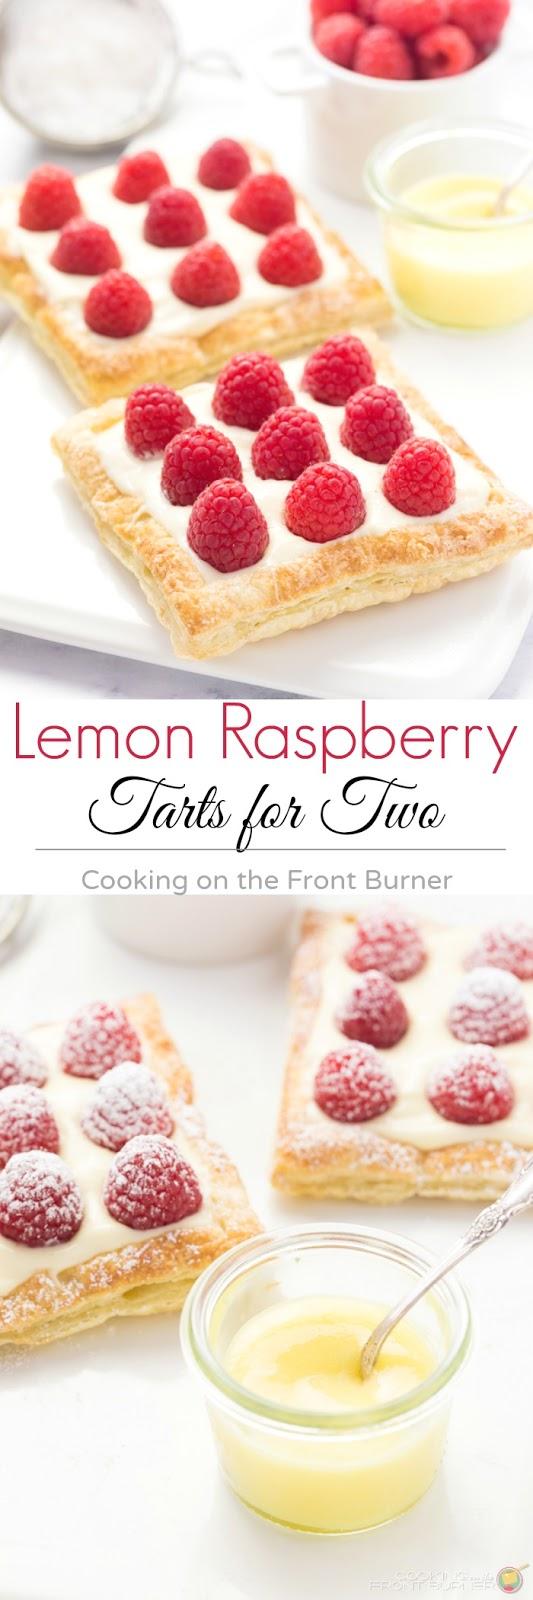 Lemon Raspberry Tarts | Cooking on the Front Burner